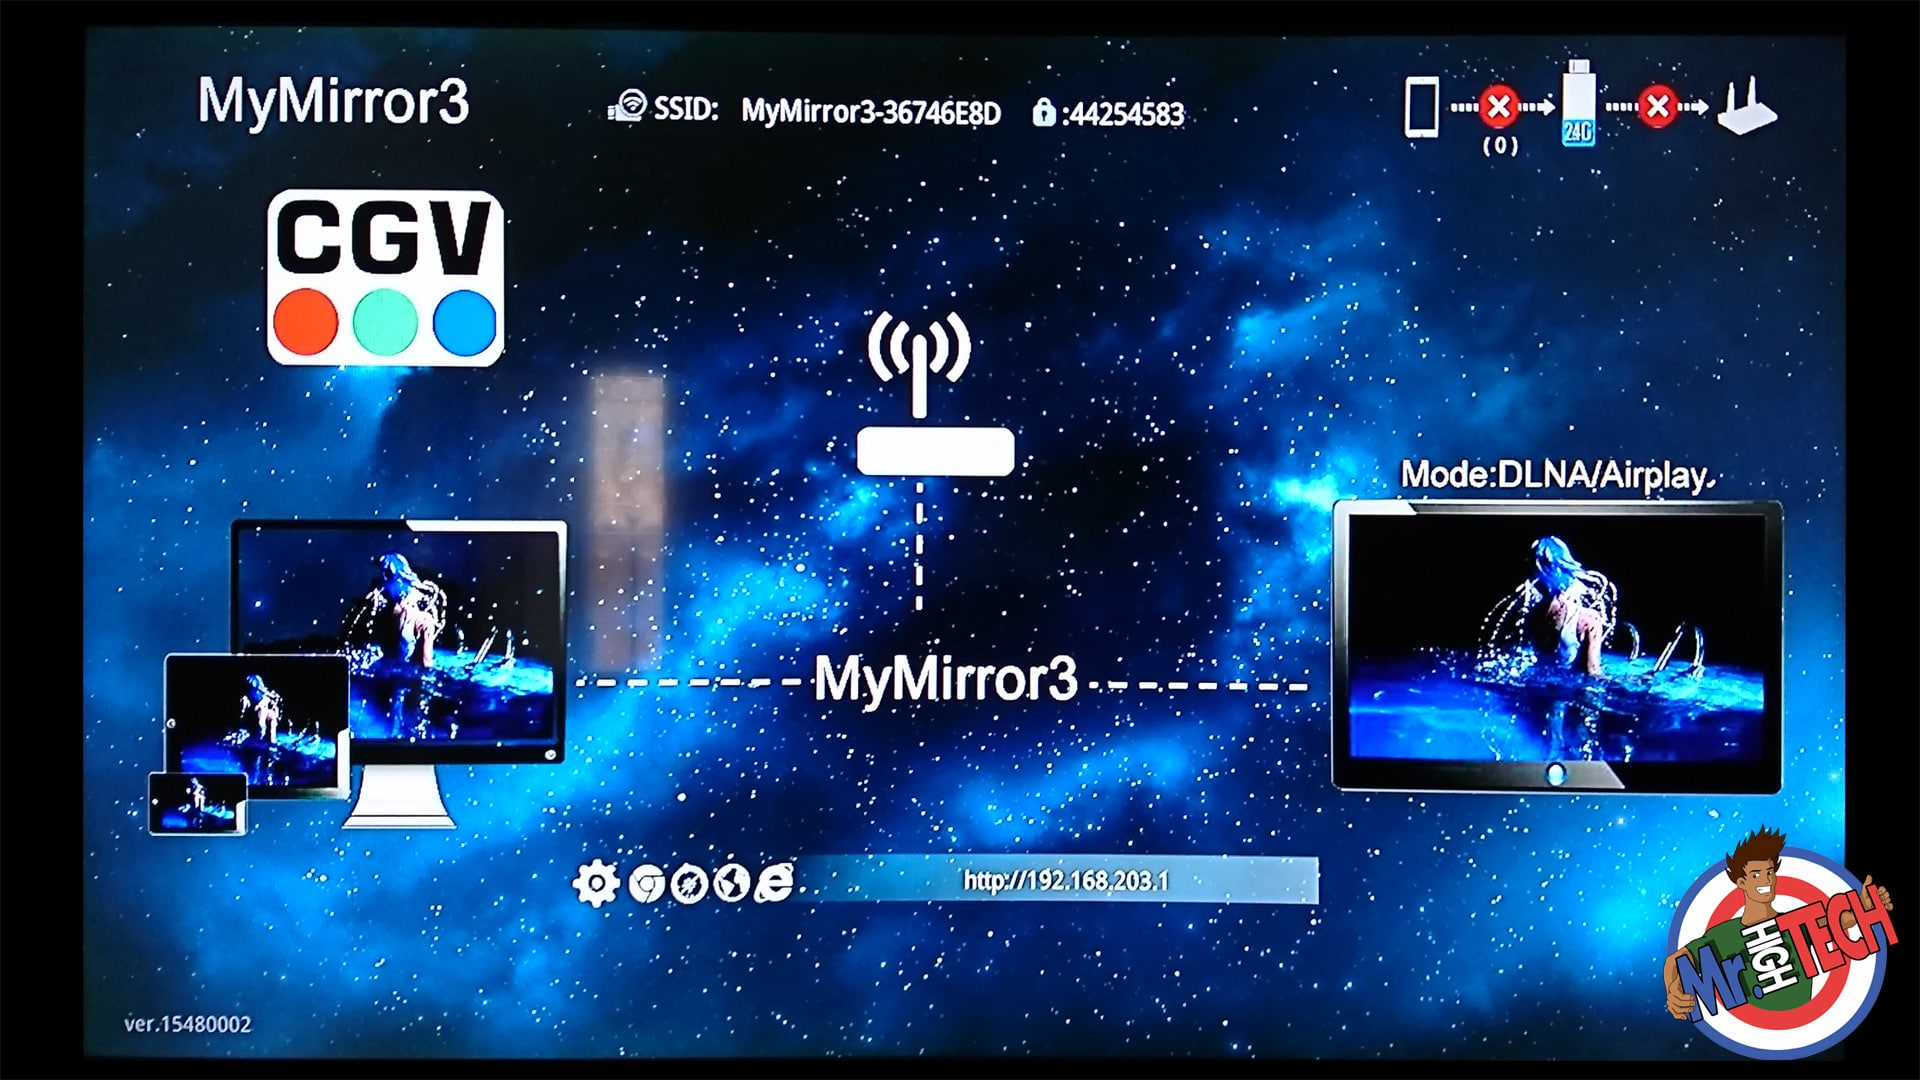 CGV My Mirror 3